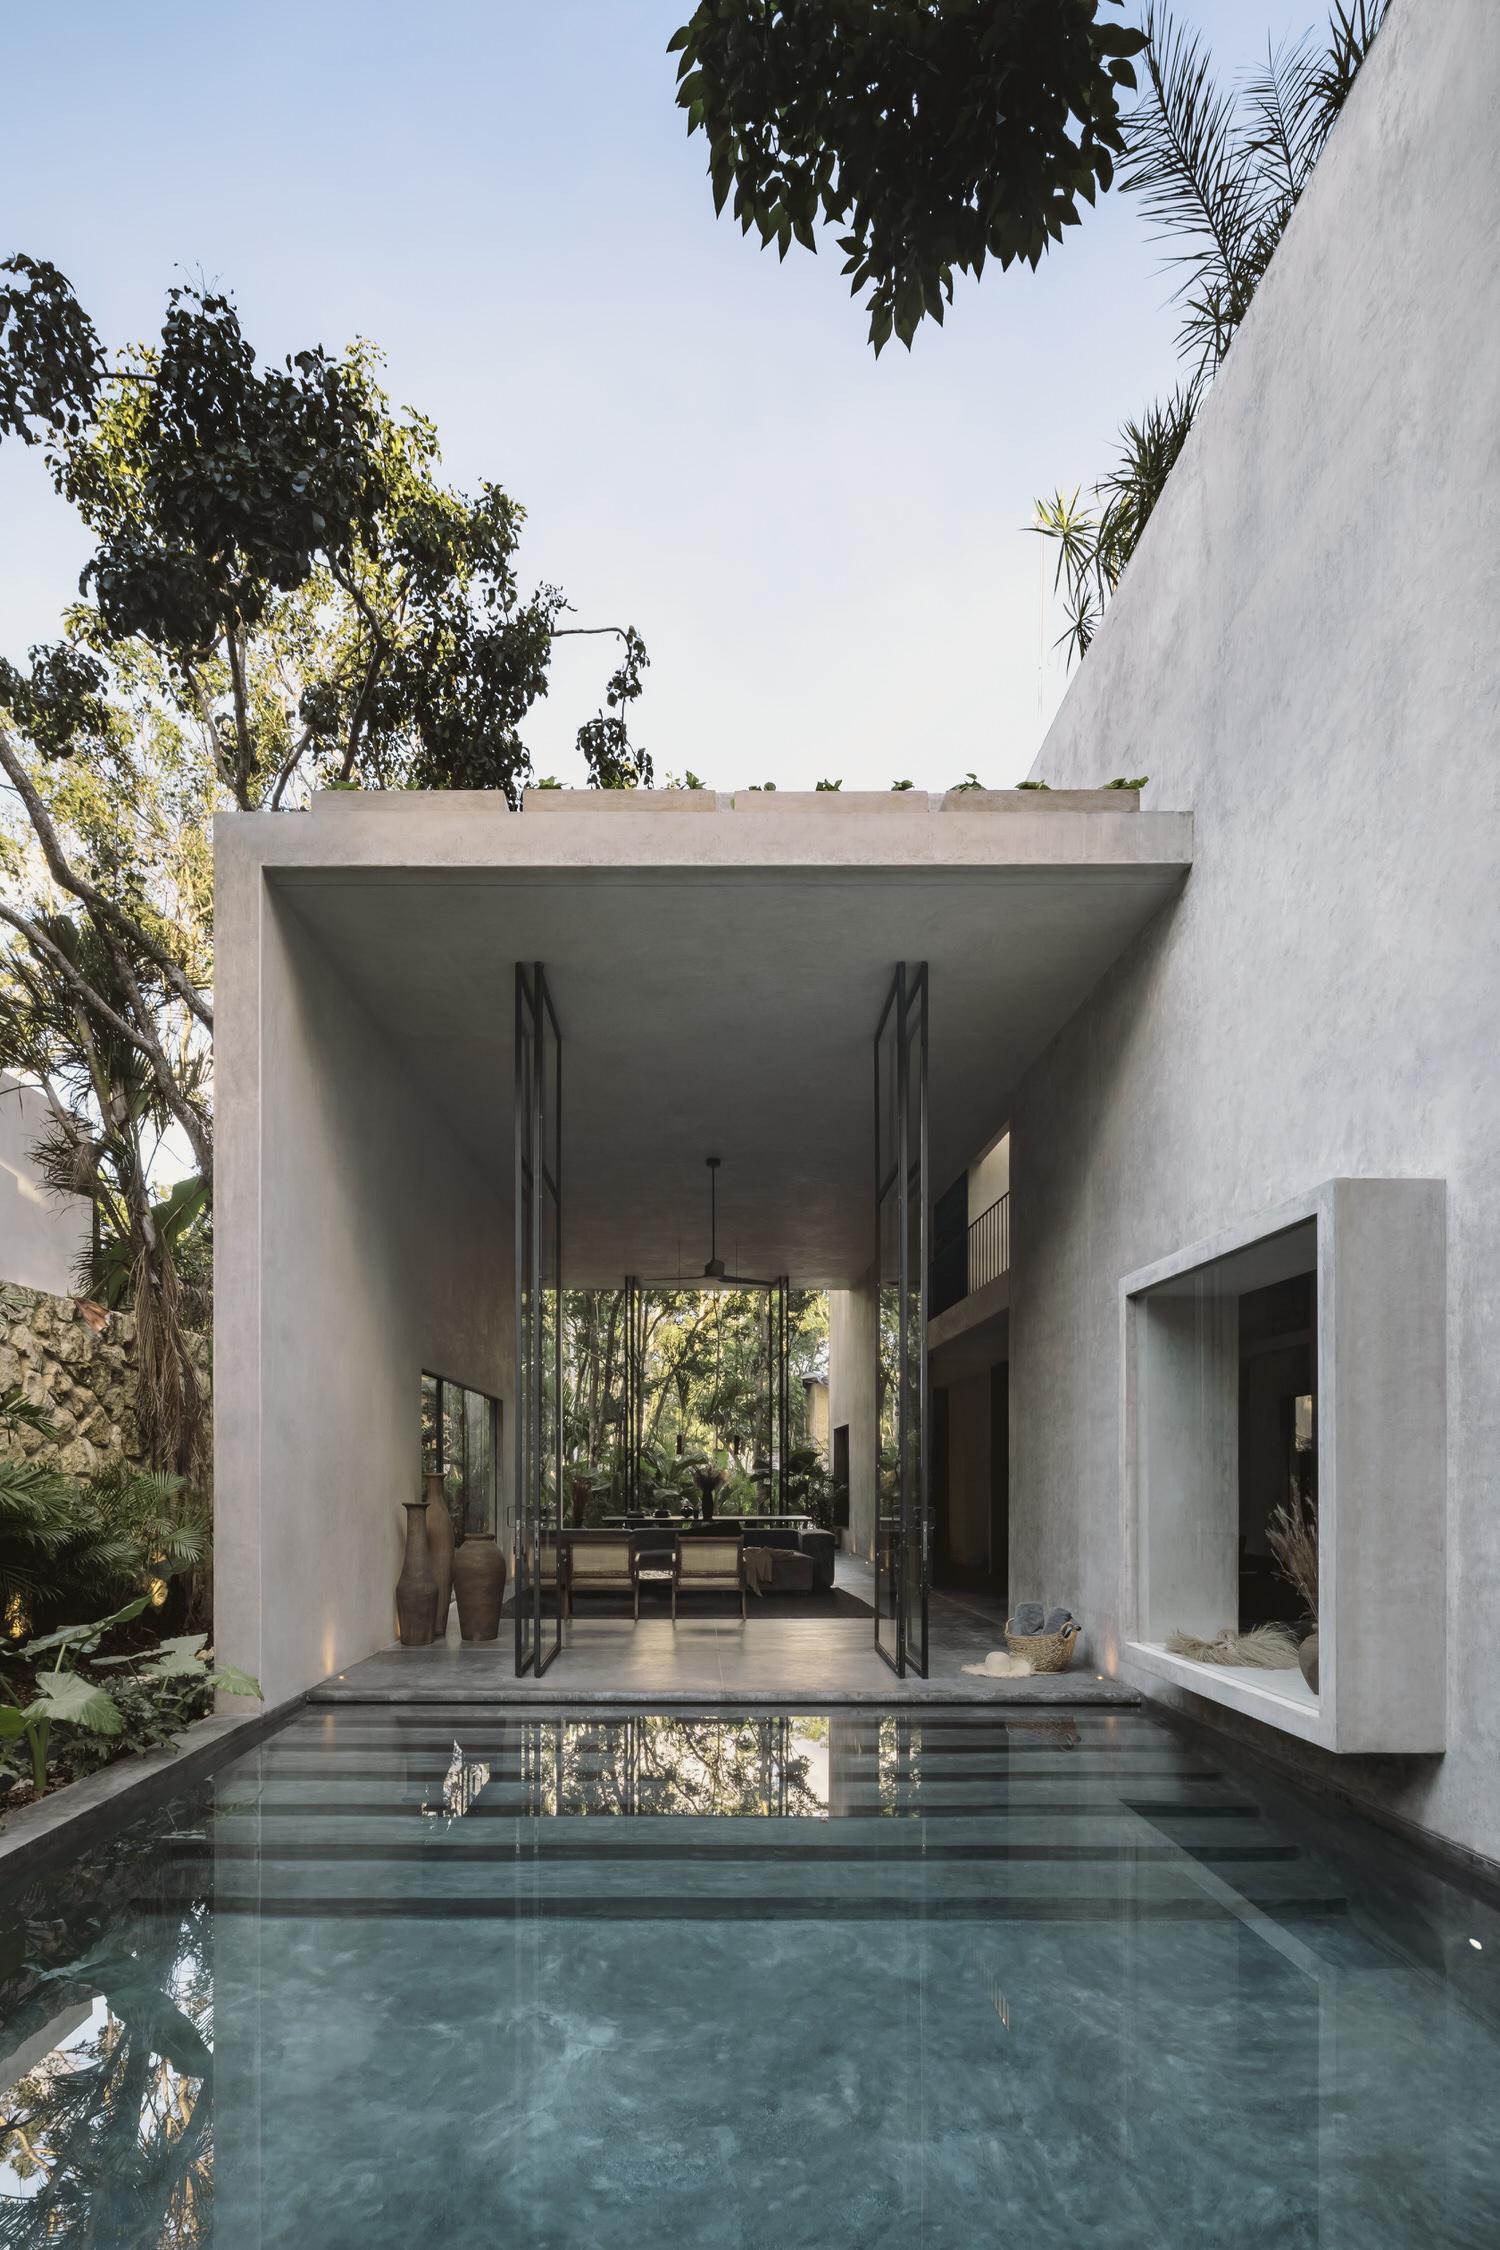 Co Lab Design Office Aviv House Tulum Mexico Arxhitecture Photo Cesar Bejar Yellowtrace 01